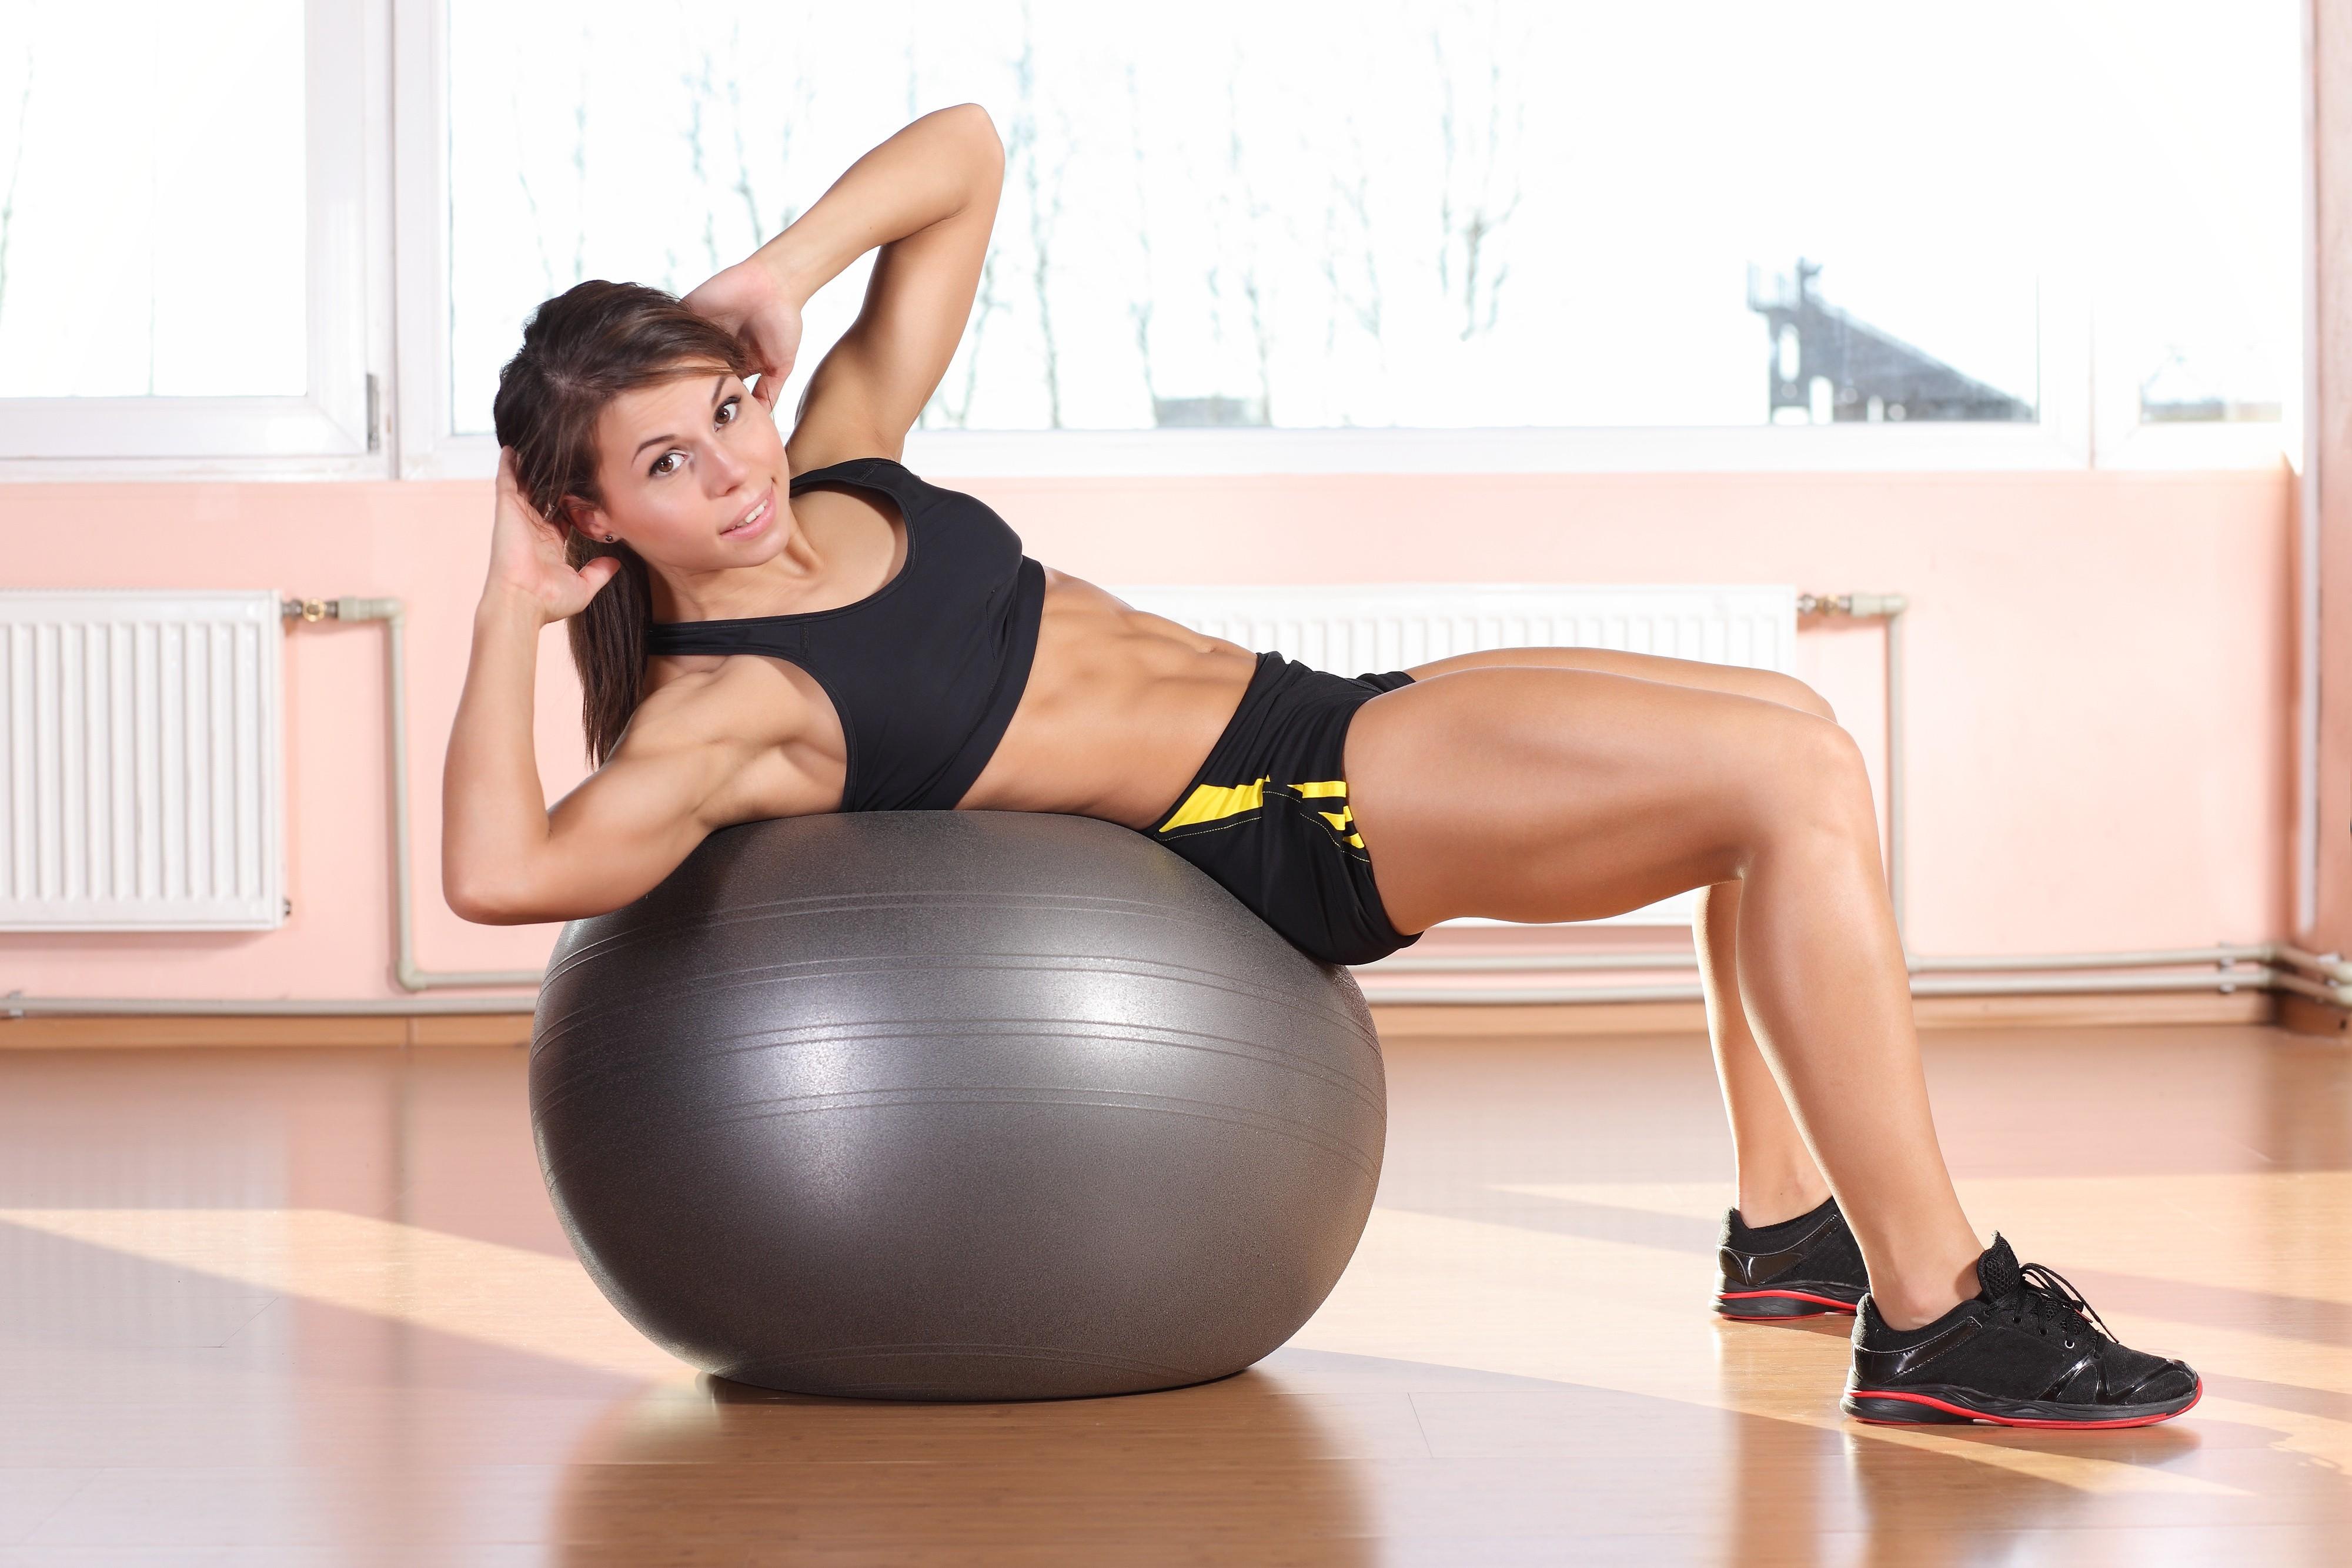 People 4000x2667 fitness model women sportswear muscular brunette armpits abs exercise